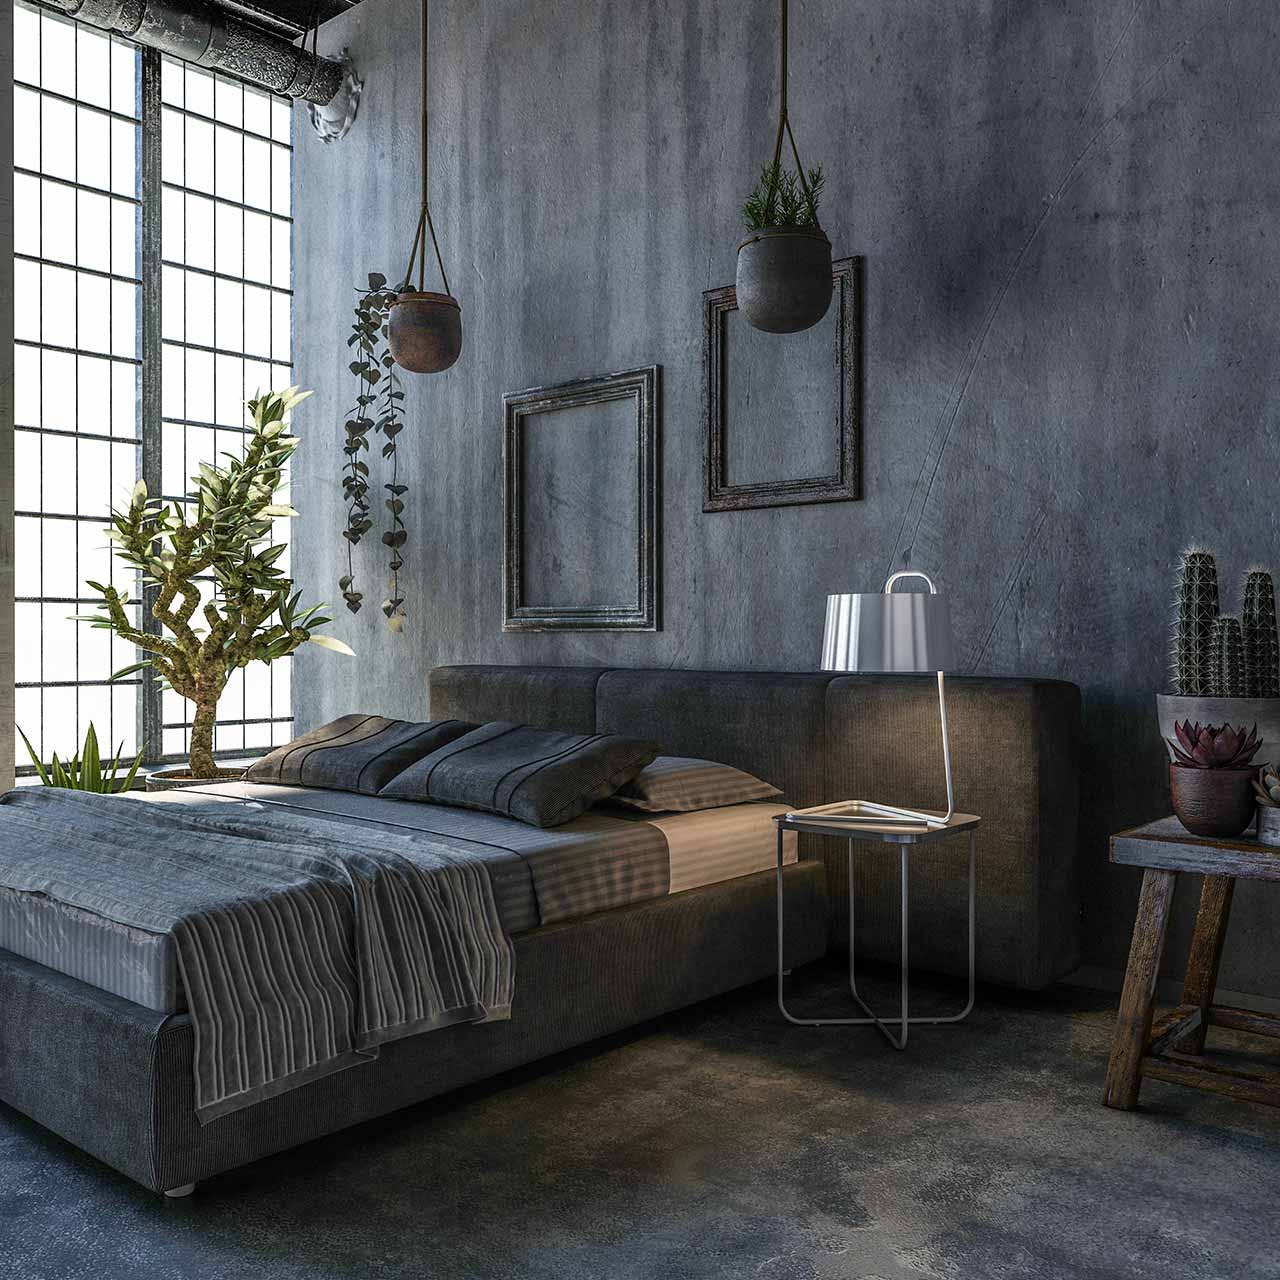 Industrial Style Bedroom Design Ideas Design Cafe